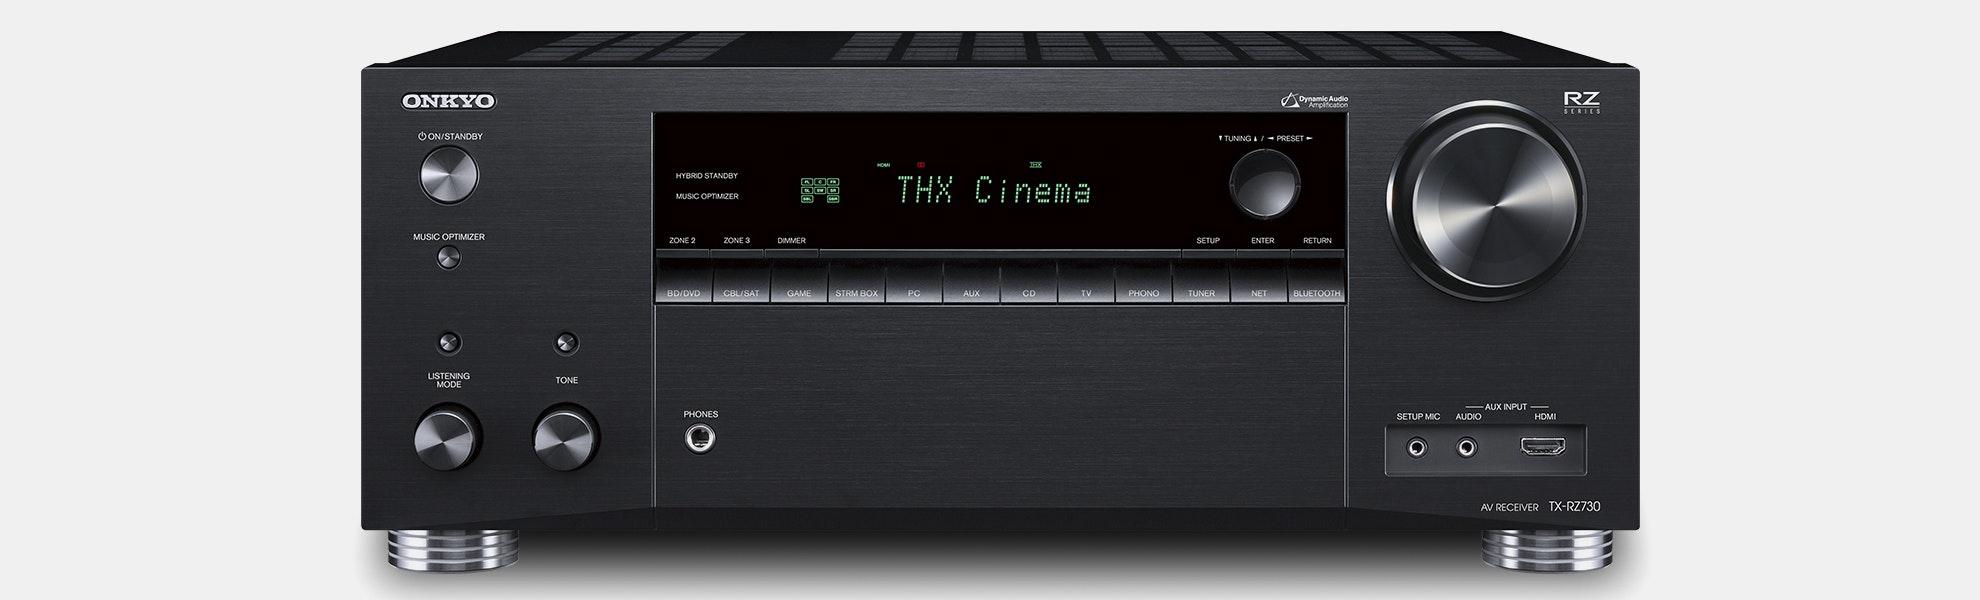 Onkyo TX-RZ730 9.2ch Network AV Receiver